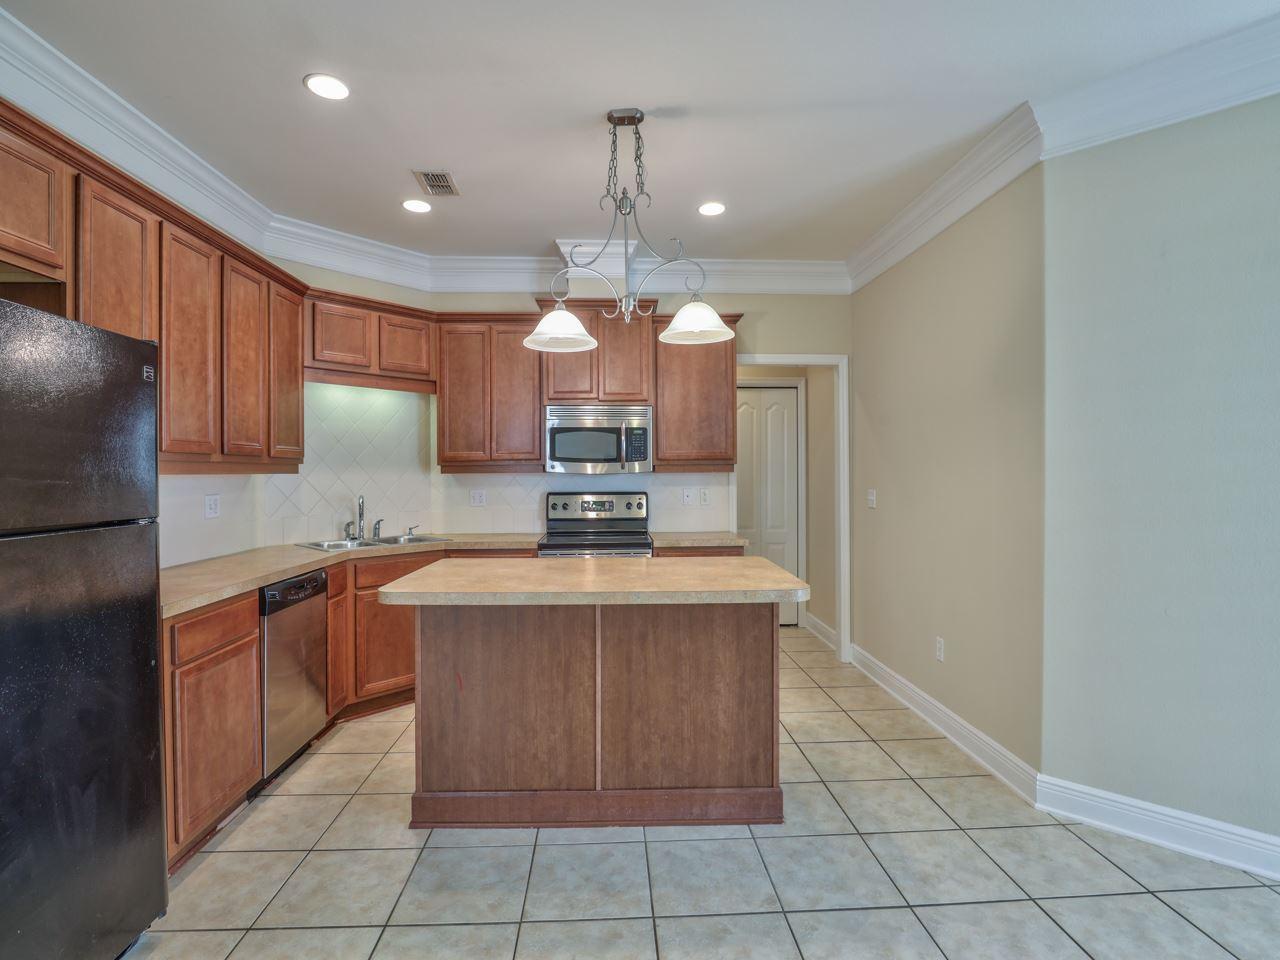 Photo of 2657 Fenwood Ct., TALLAHASSEE, FL 32303 (MLS # 325954)